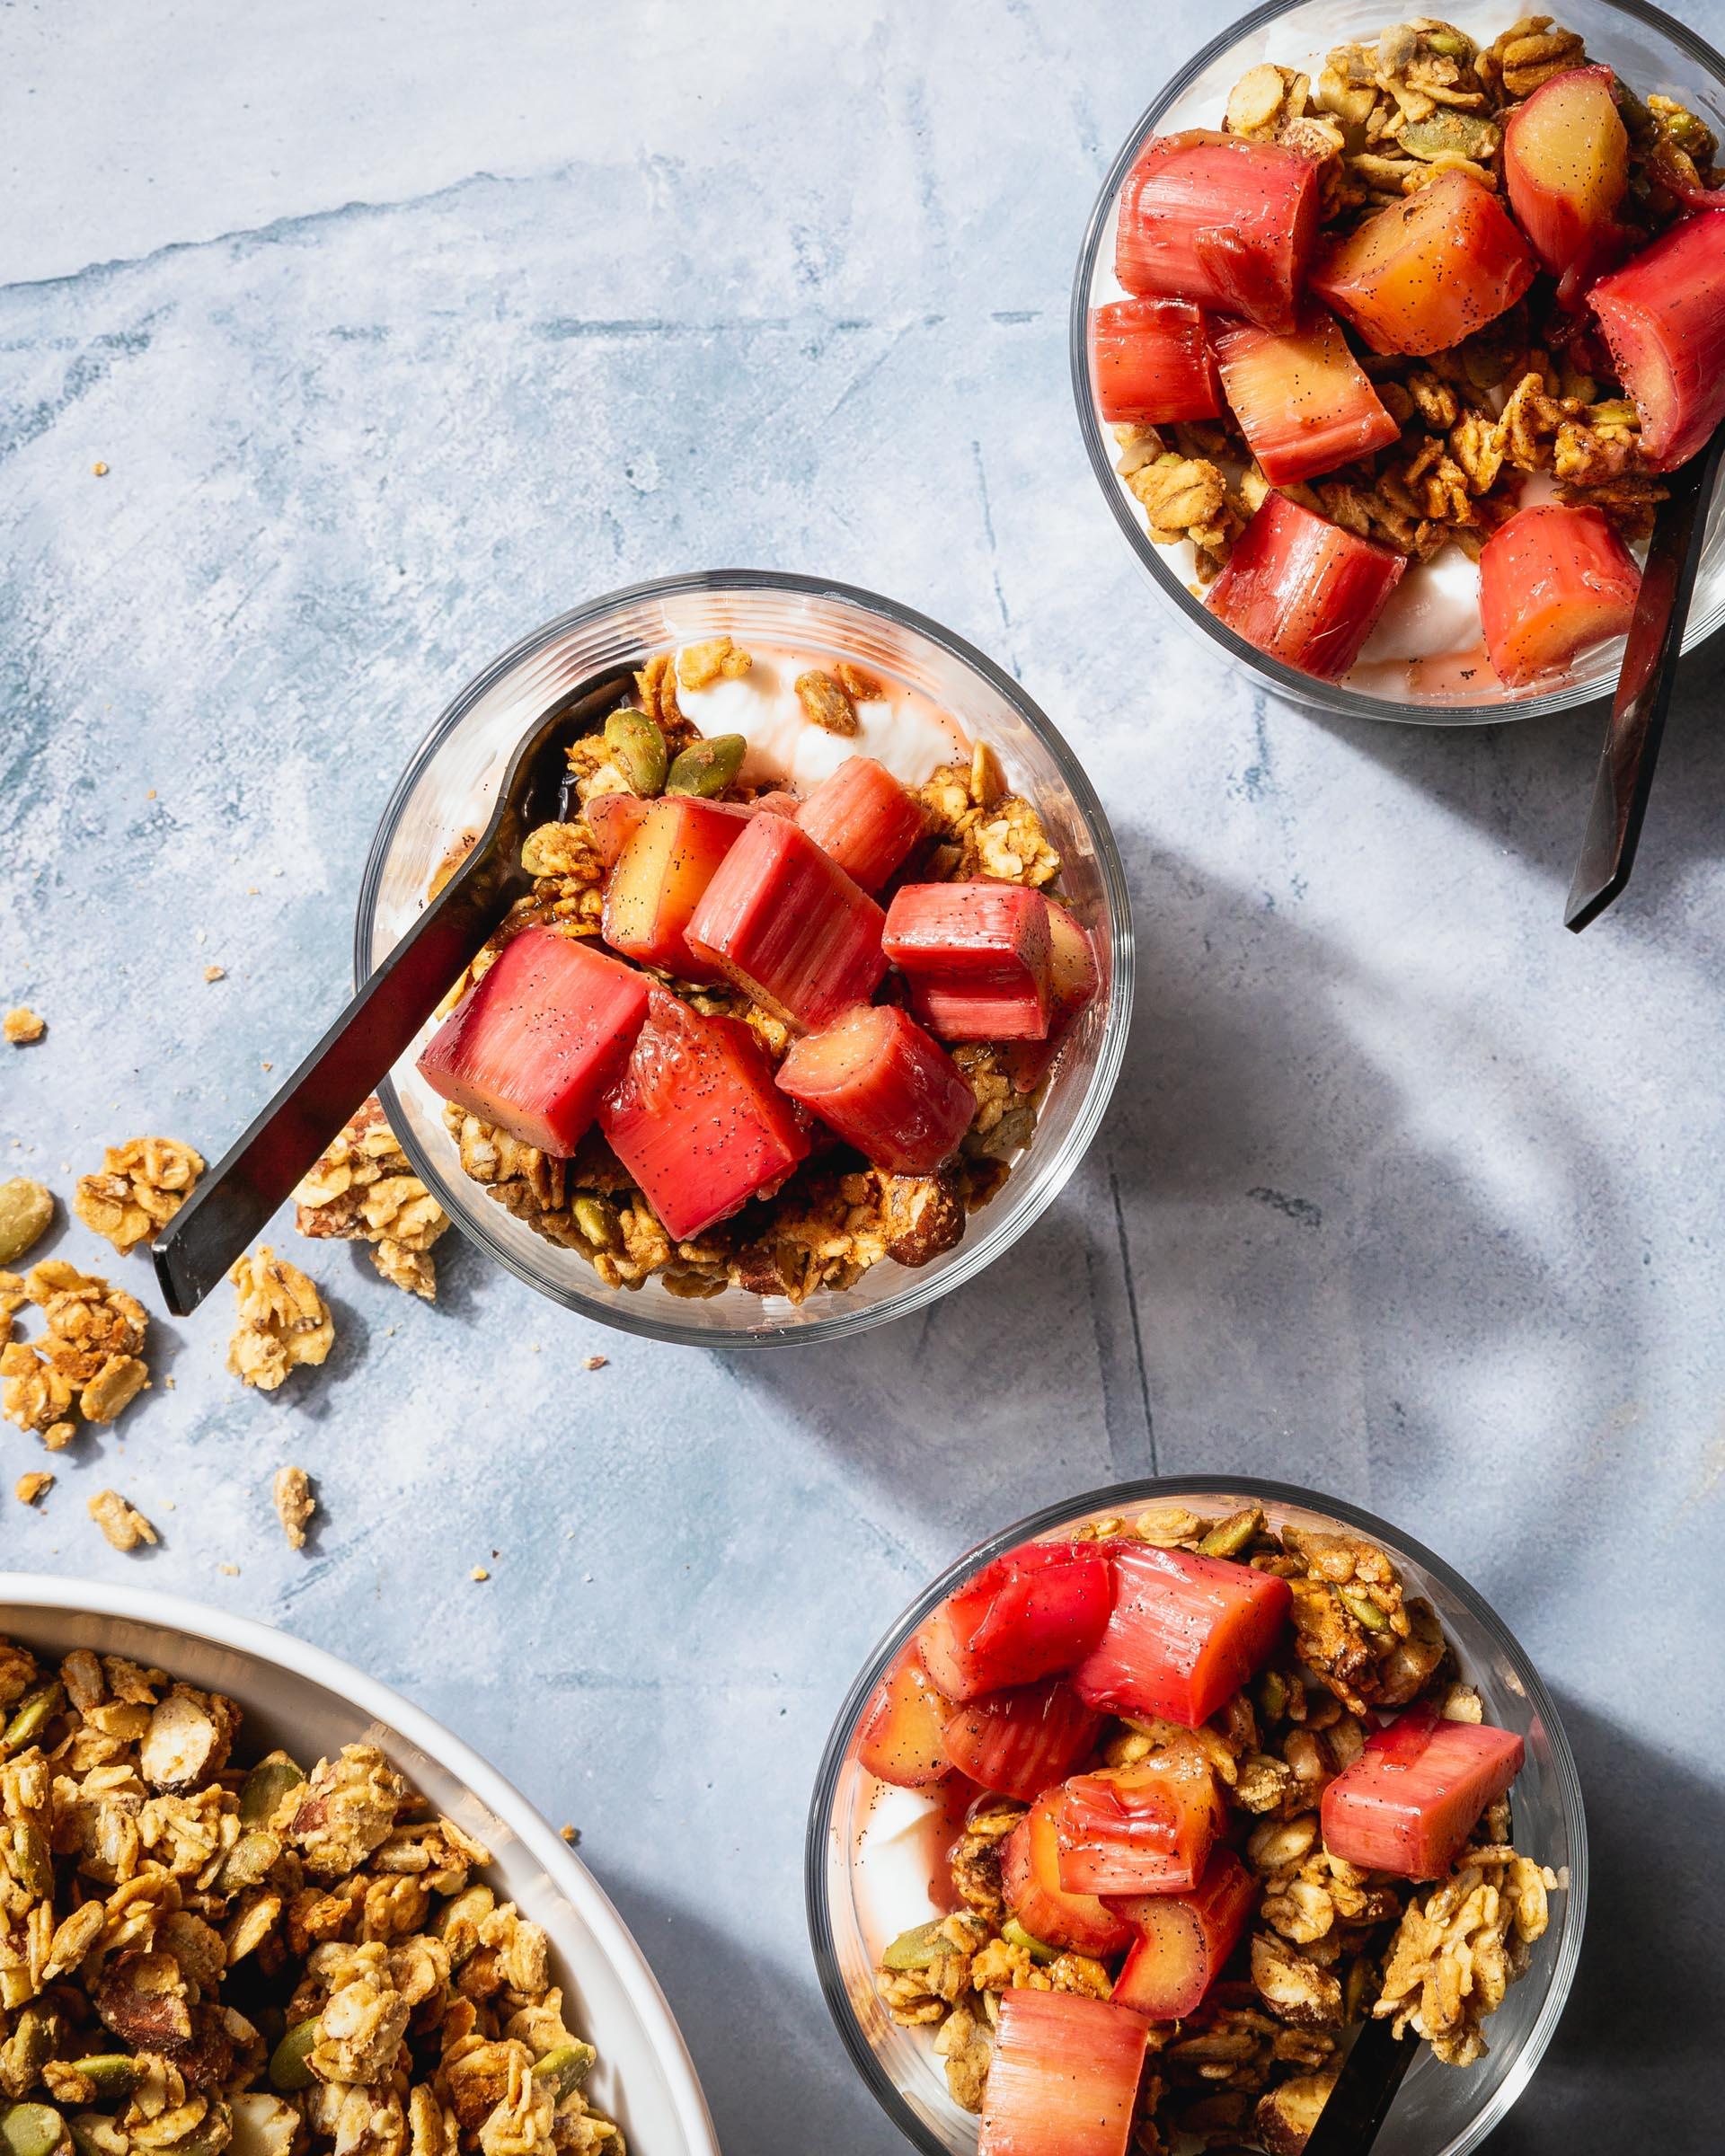 granola bar with stewed rhubarb